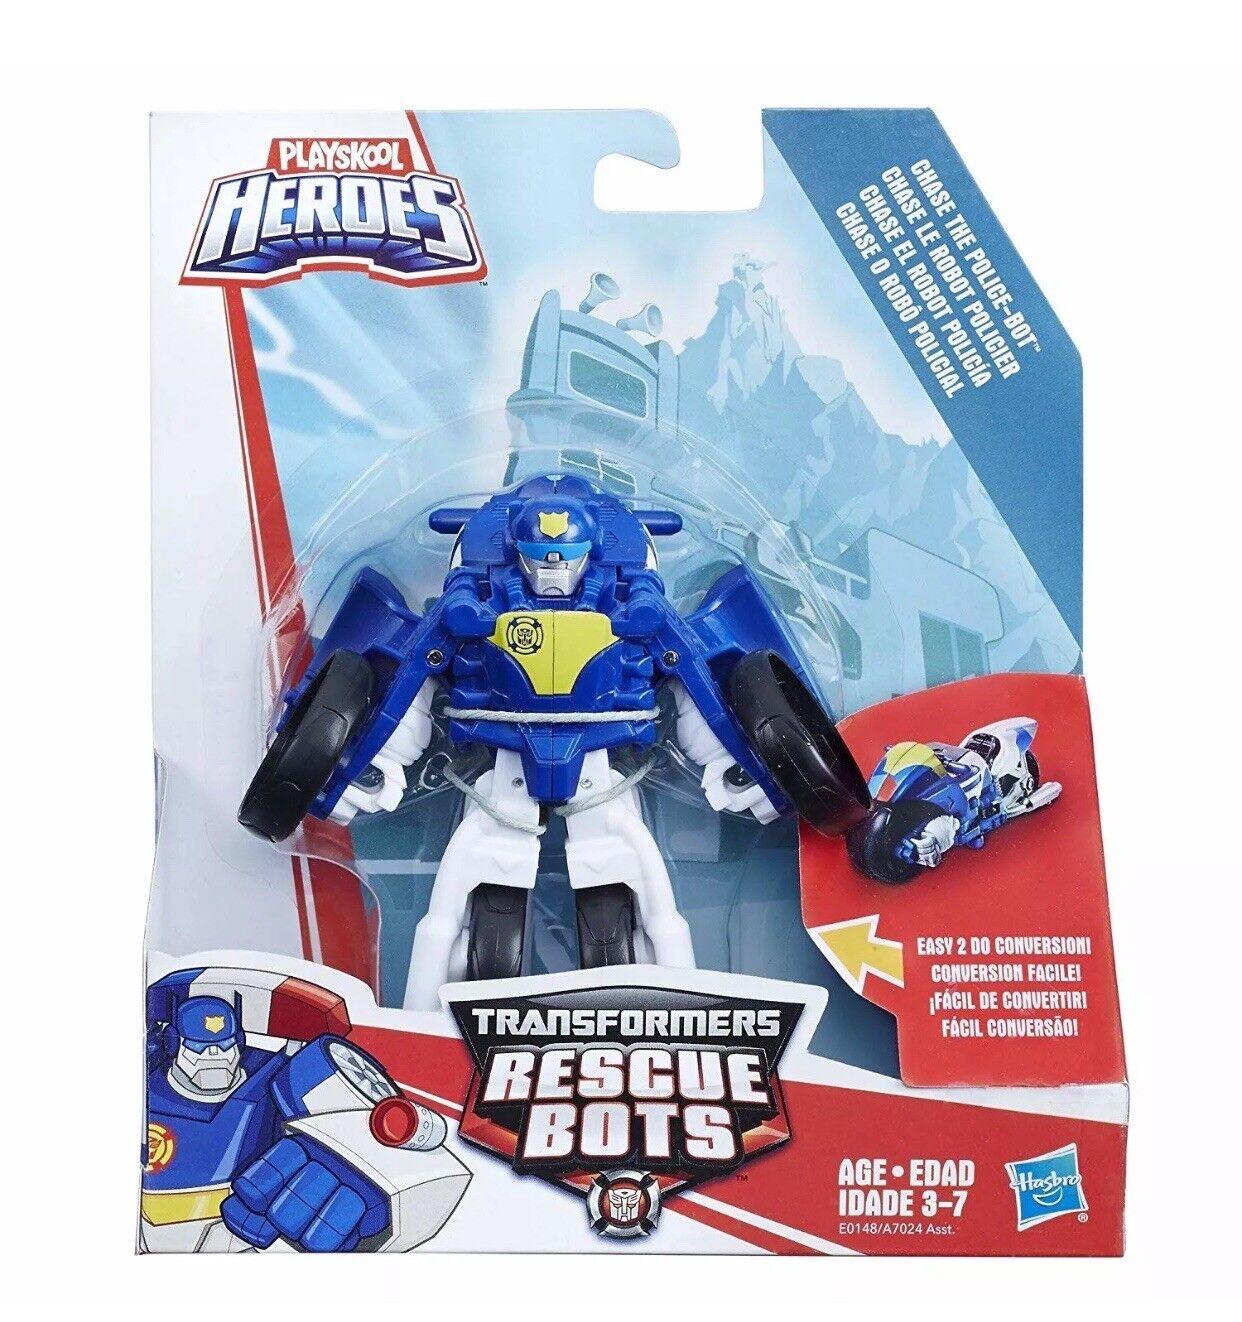 Chase MOTORCYCLE polizia Bot version -  Transformers Rescue Heroes - Playskool  più economico